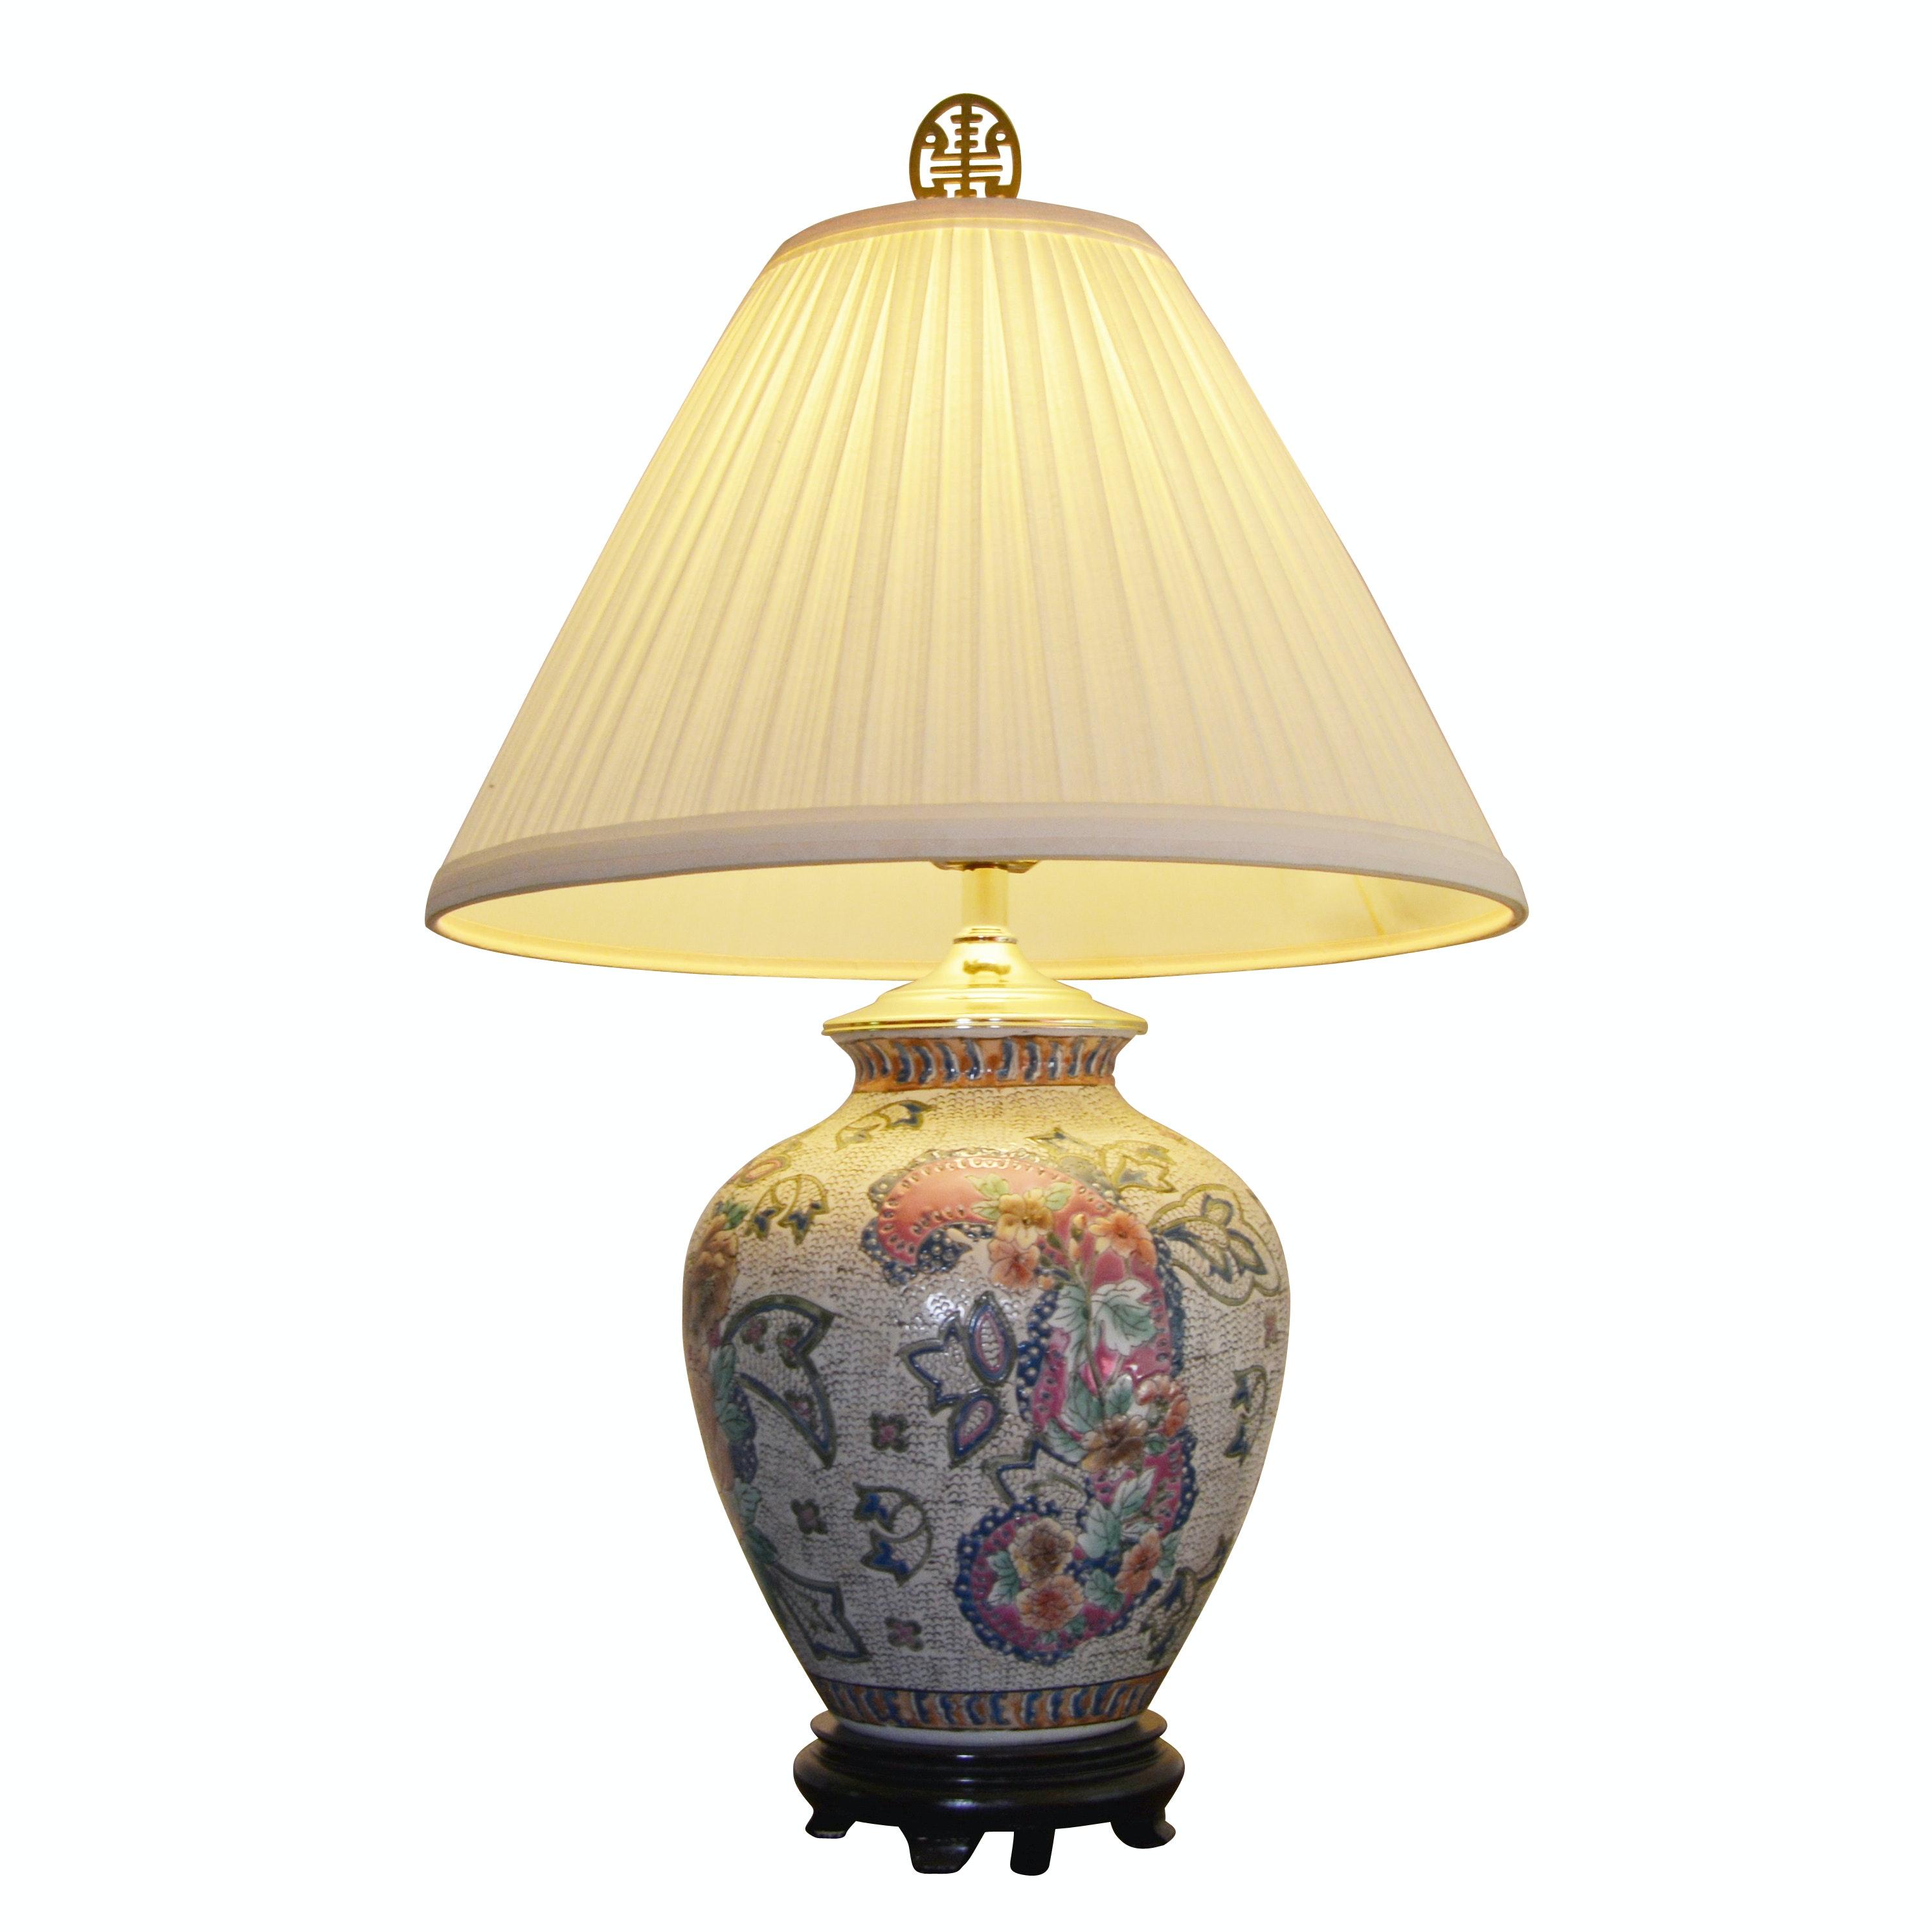 Chinoiserie Ceramic Enameled Table Lamp